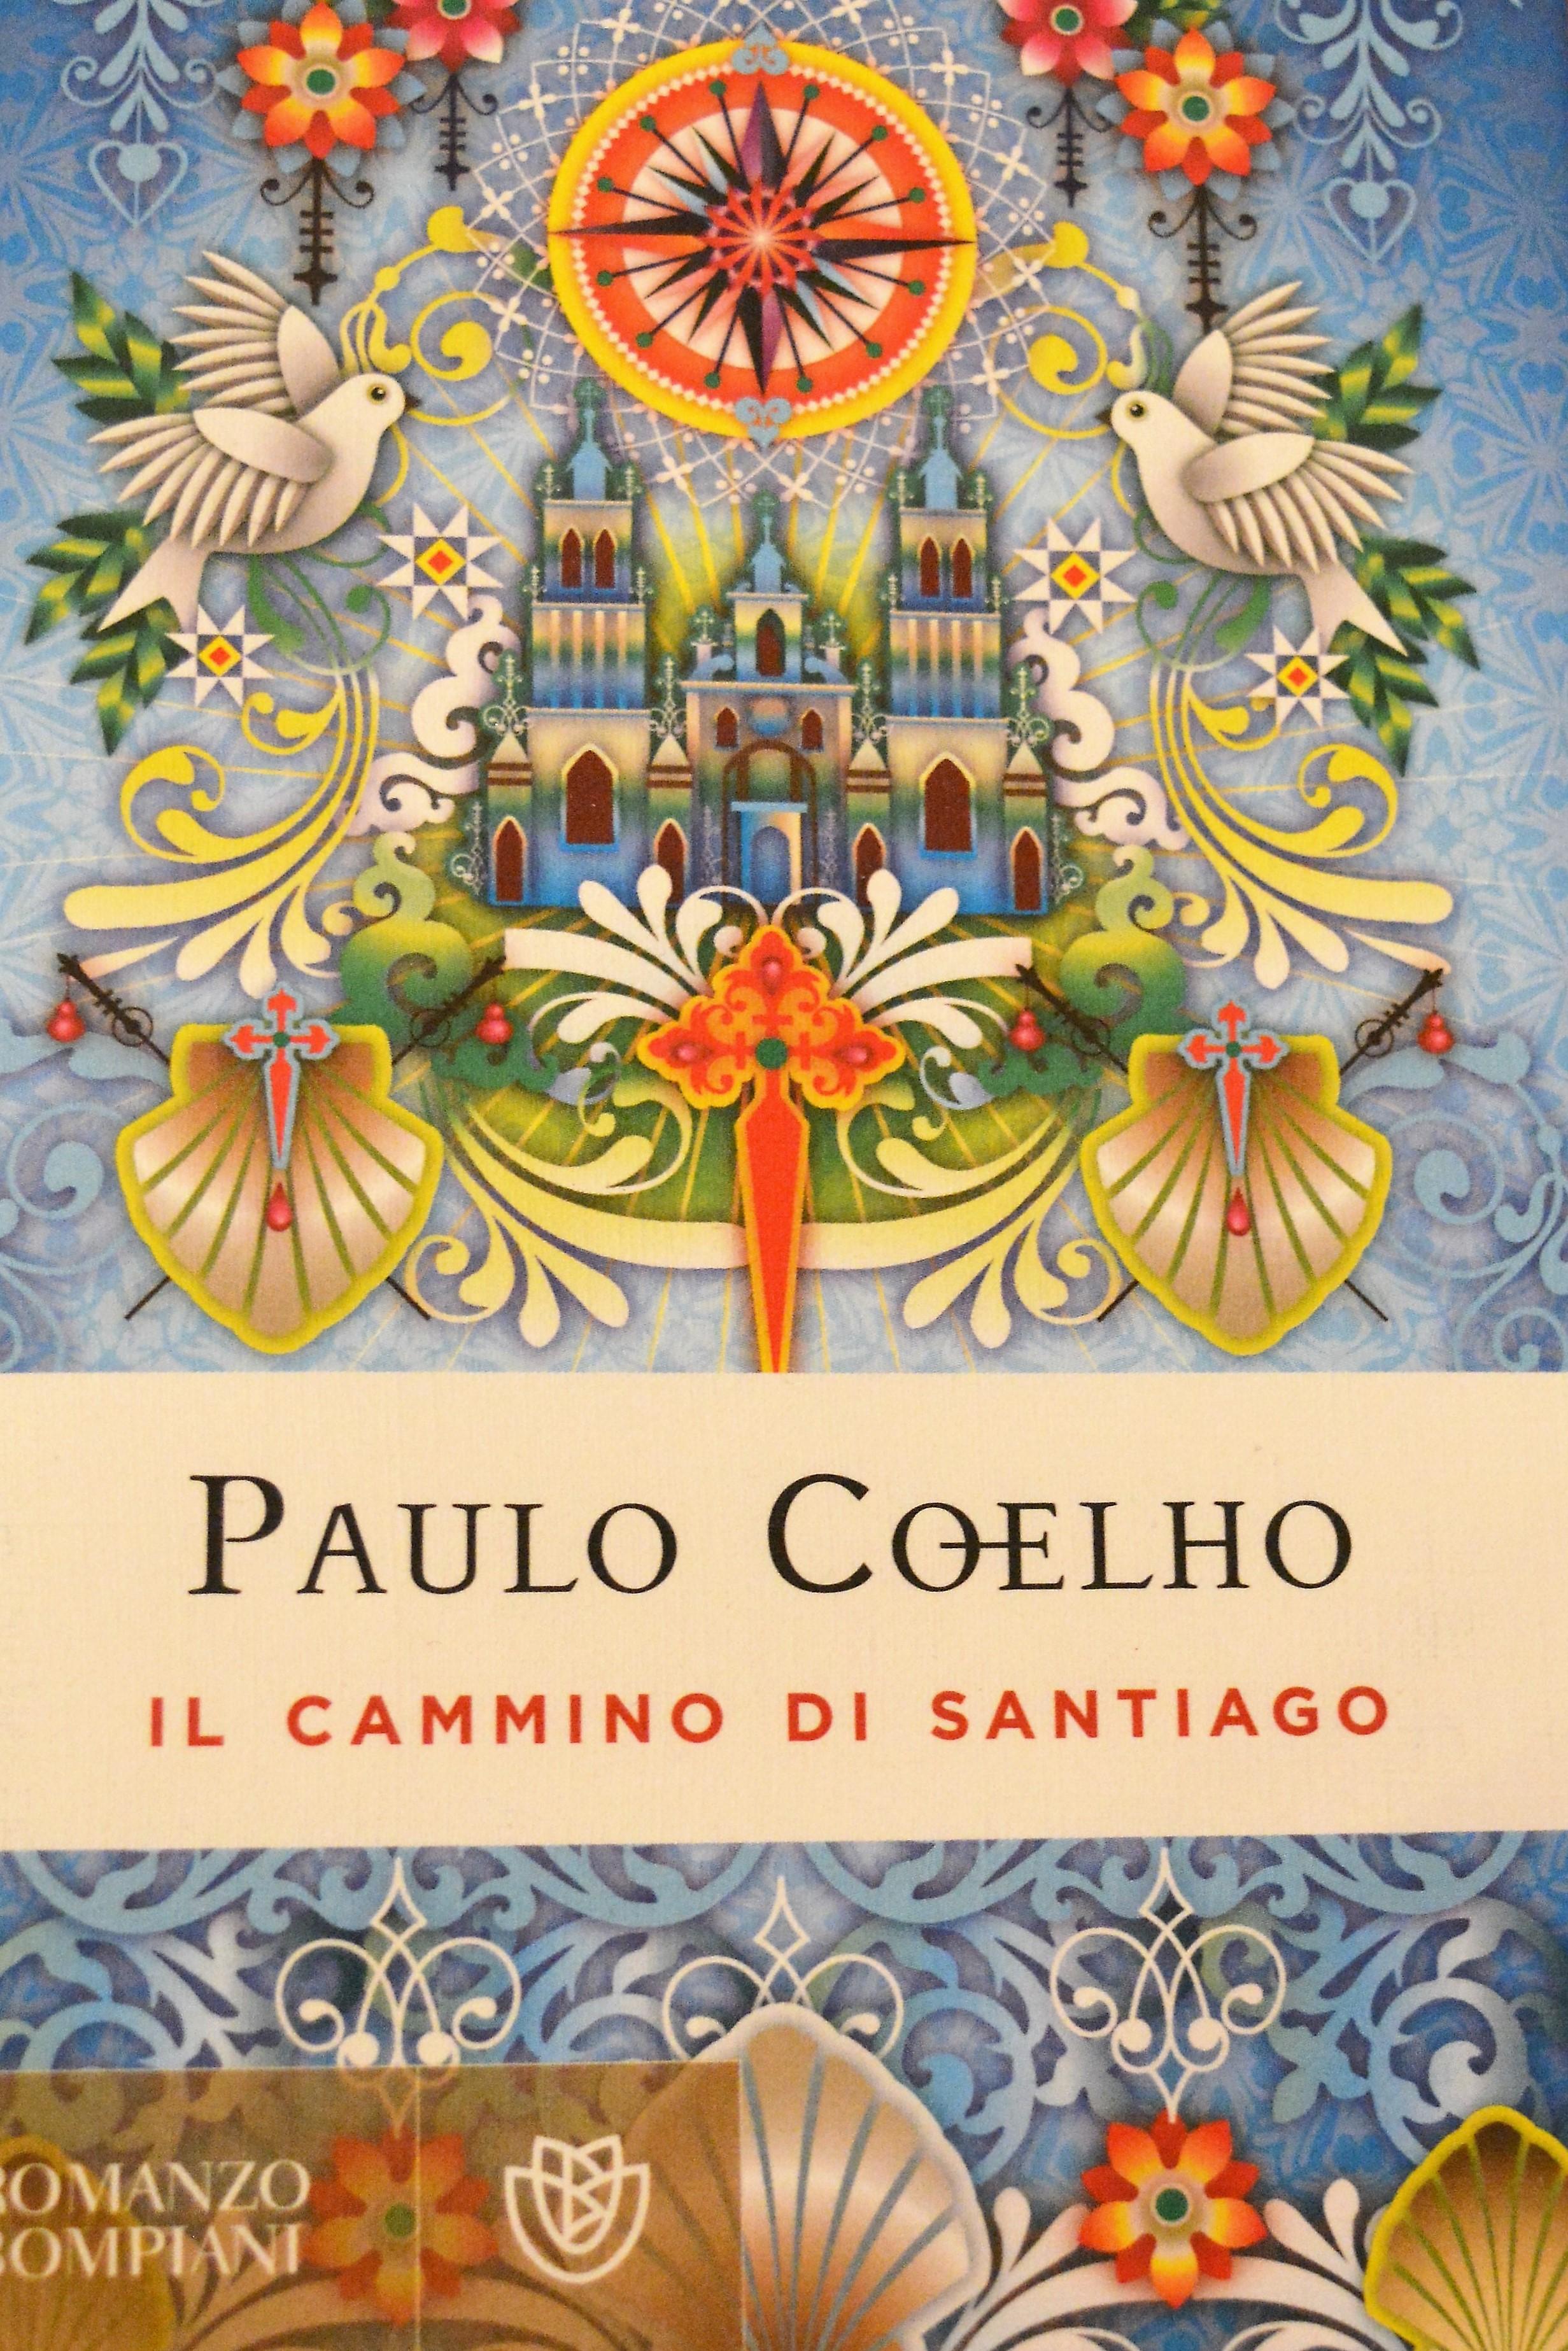 Paulo Coelho - Il cammino di Santiago - aspassoperlaspagna.it